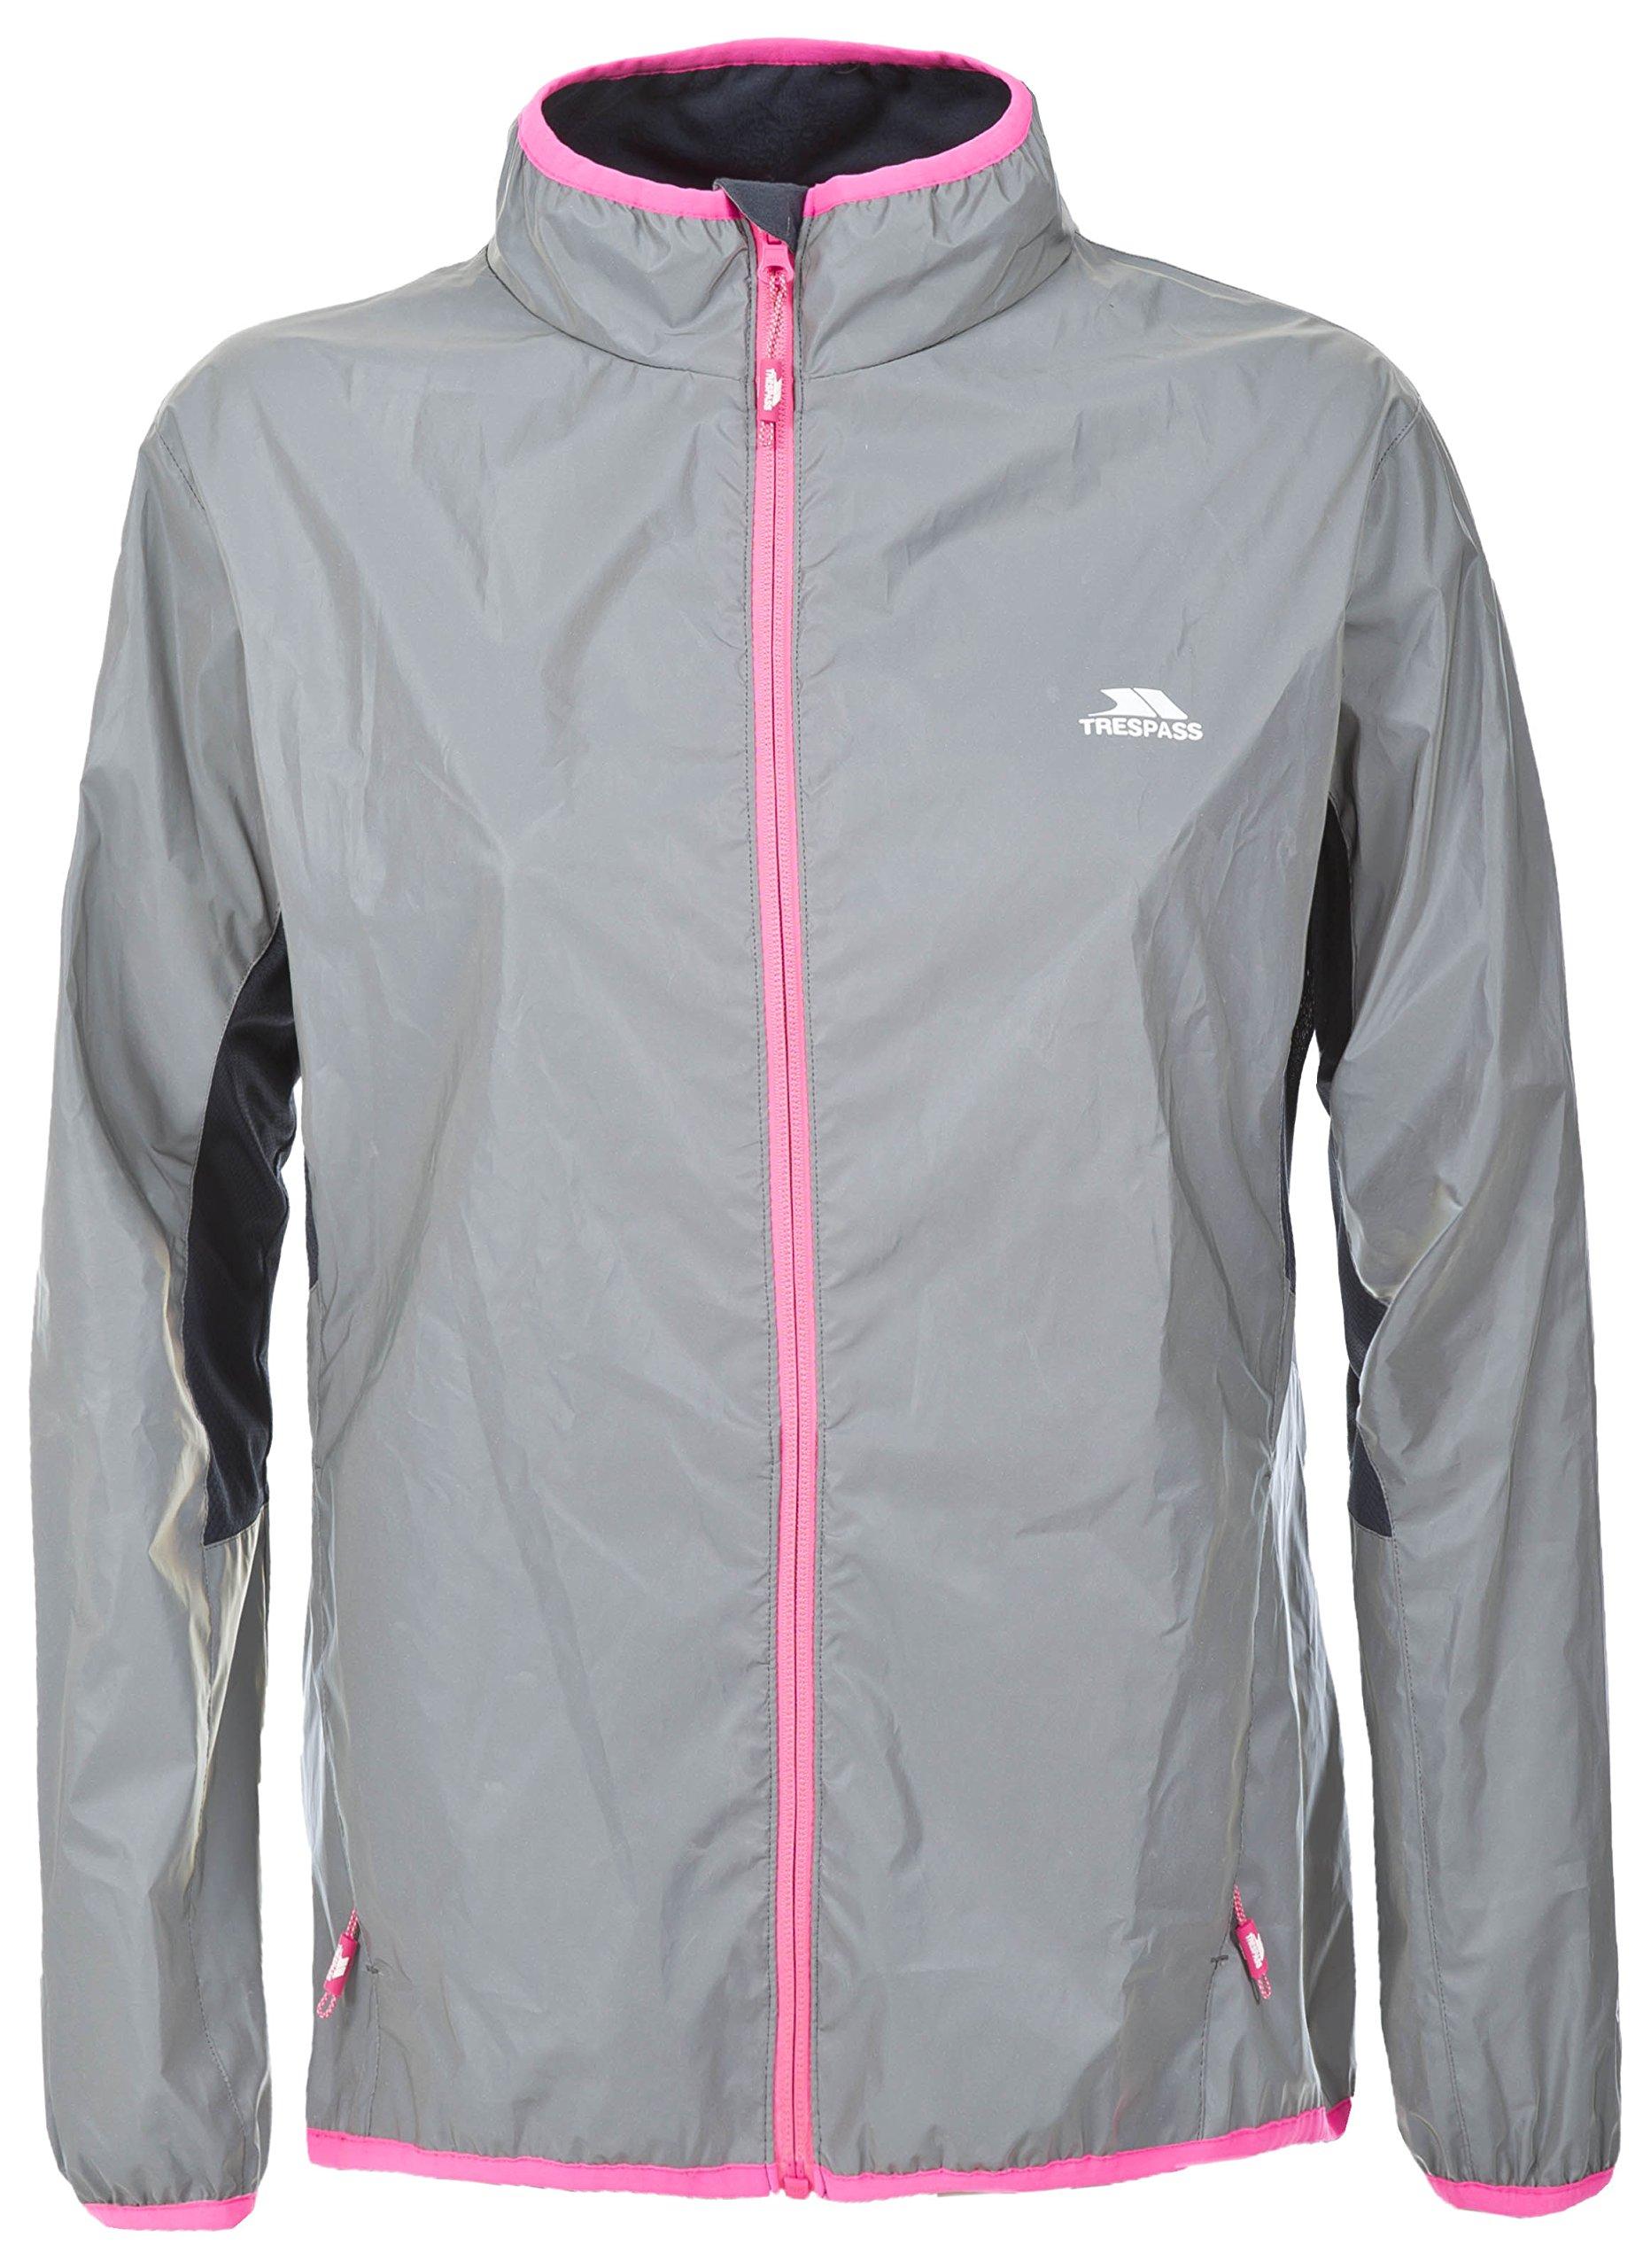 Trespass Women's Lumi Active Windproof and Waterproof Cycling and Running Outdoor Luminous Jacket 1